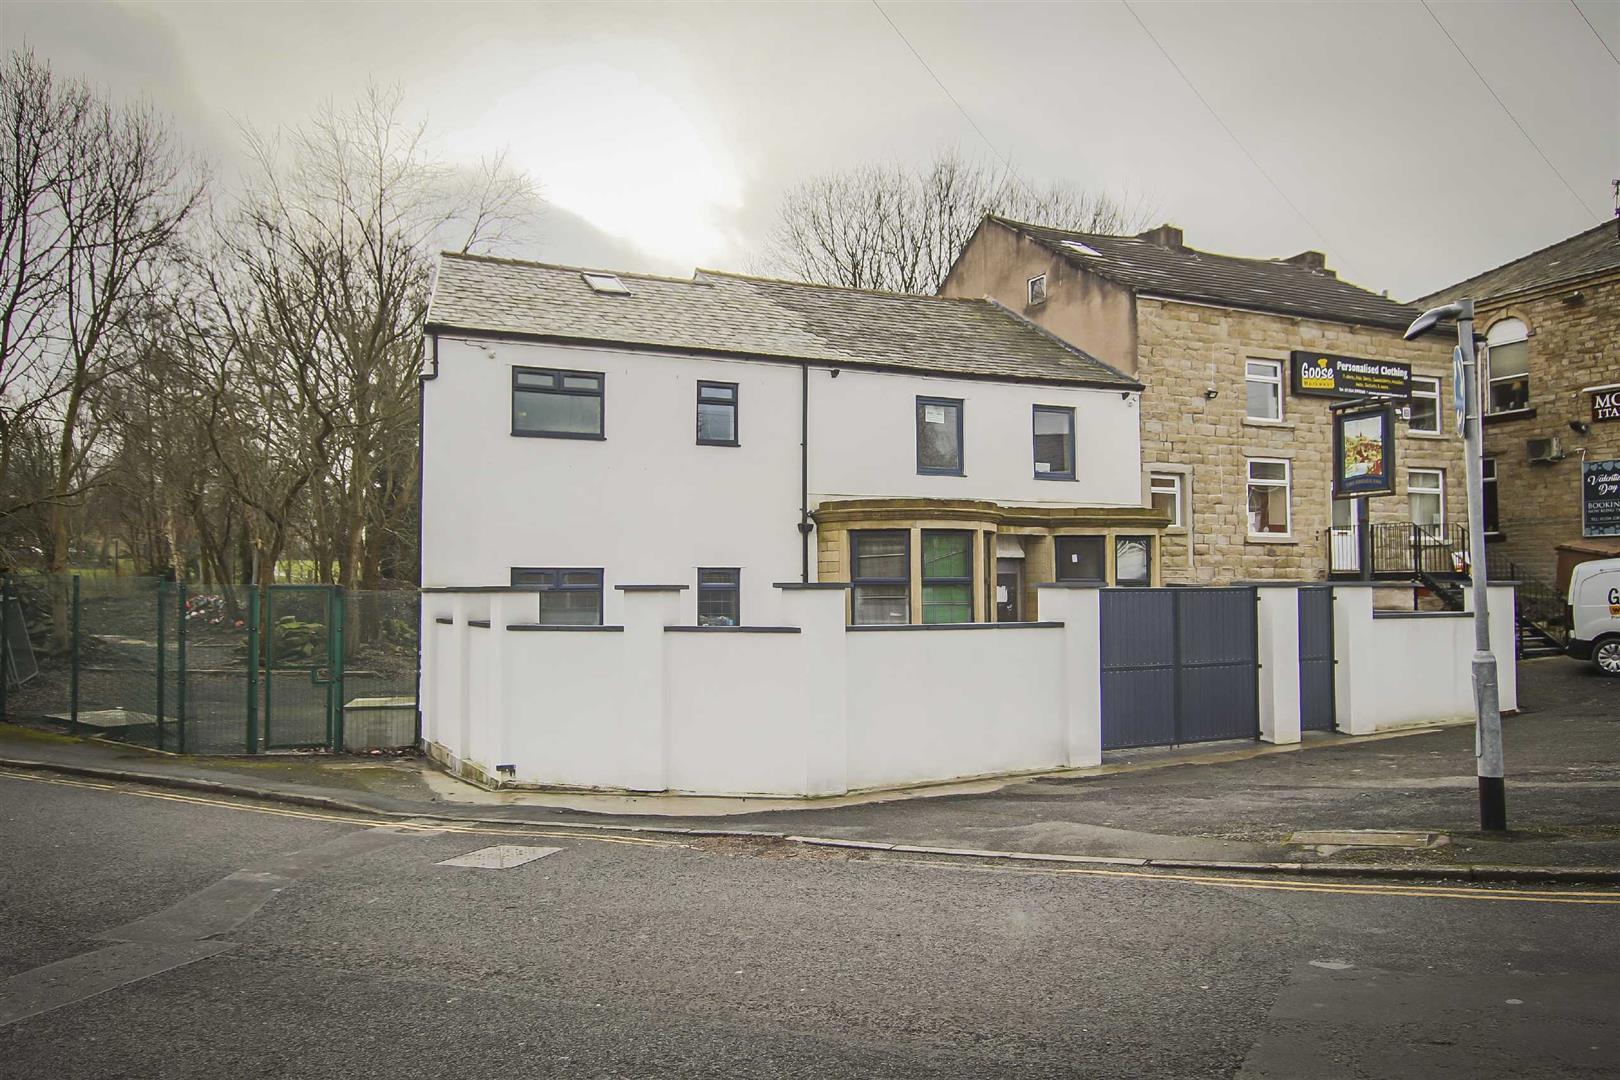 Development Site Land For Sale - Main Image